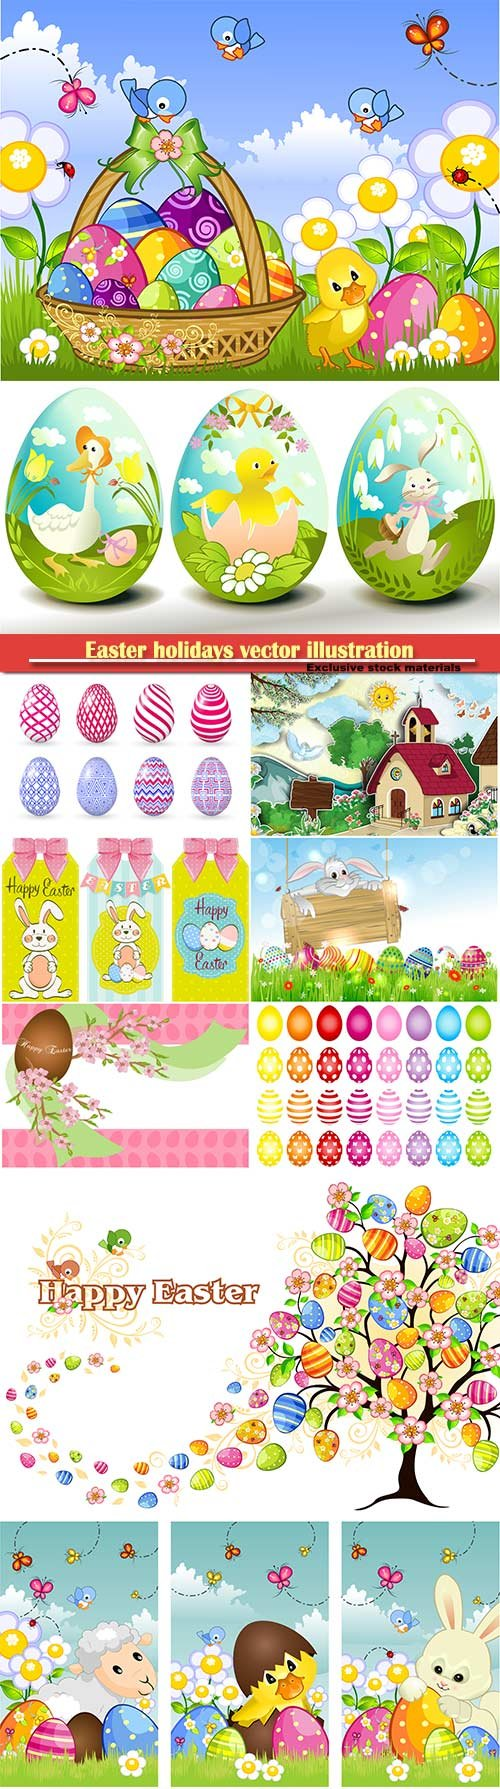 Easter holidays vector illustration # 10